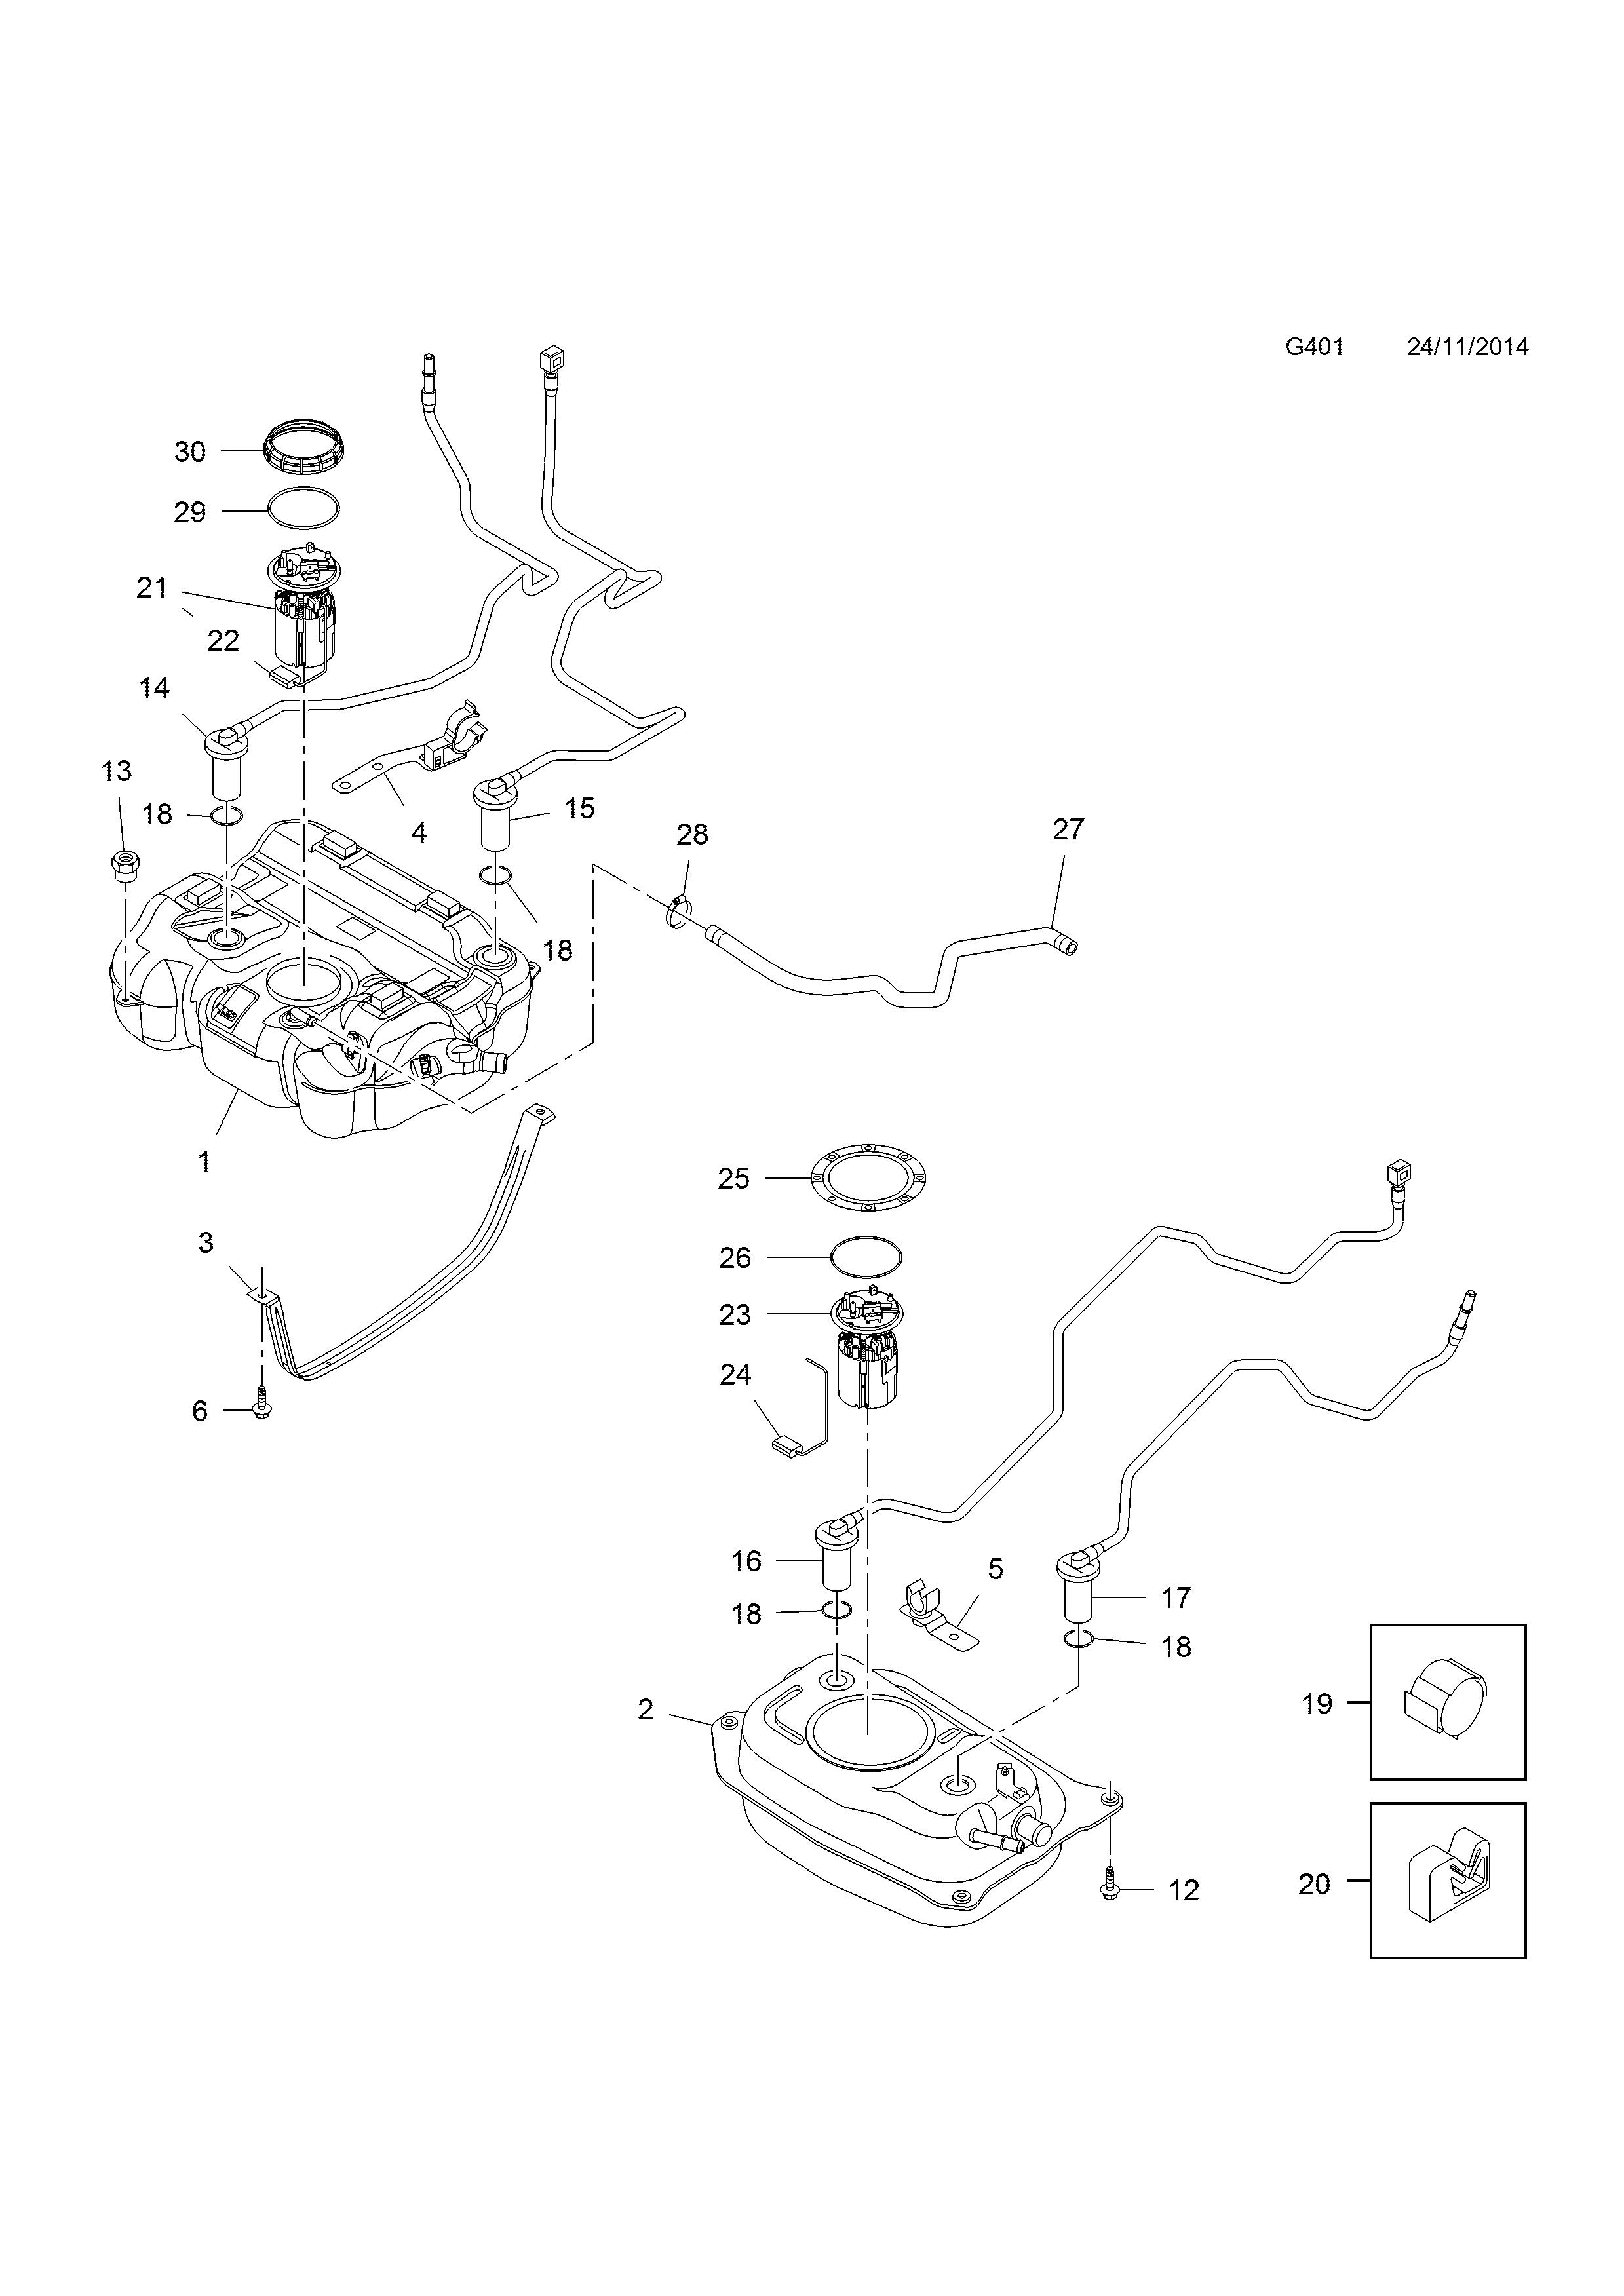 Remarkable Vauxhall Fuel Pressure Diagram Circuit Diagram Template Wiring Cloud Nuvitbieswglorg